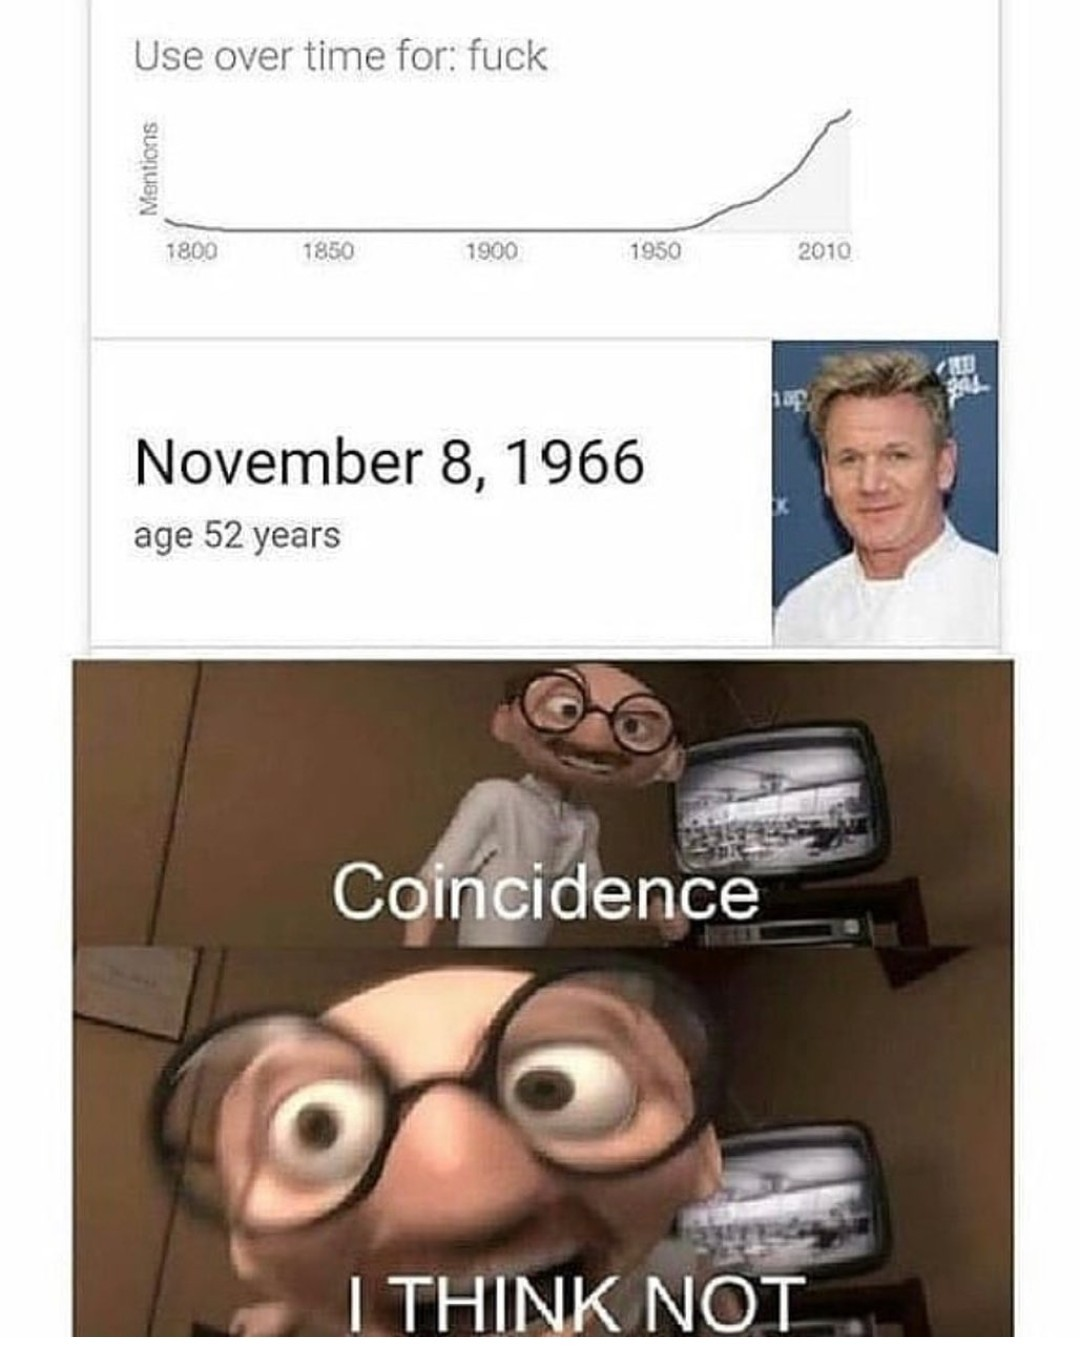 Coincidence? - meme